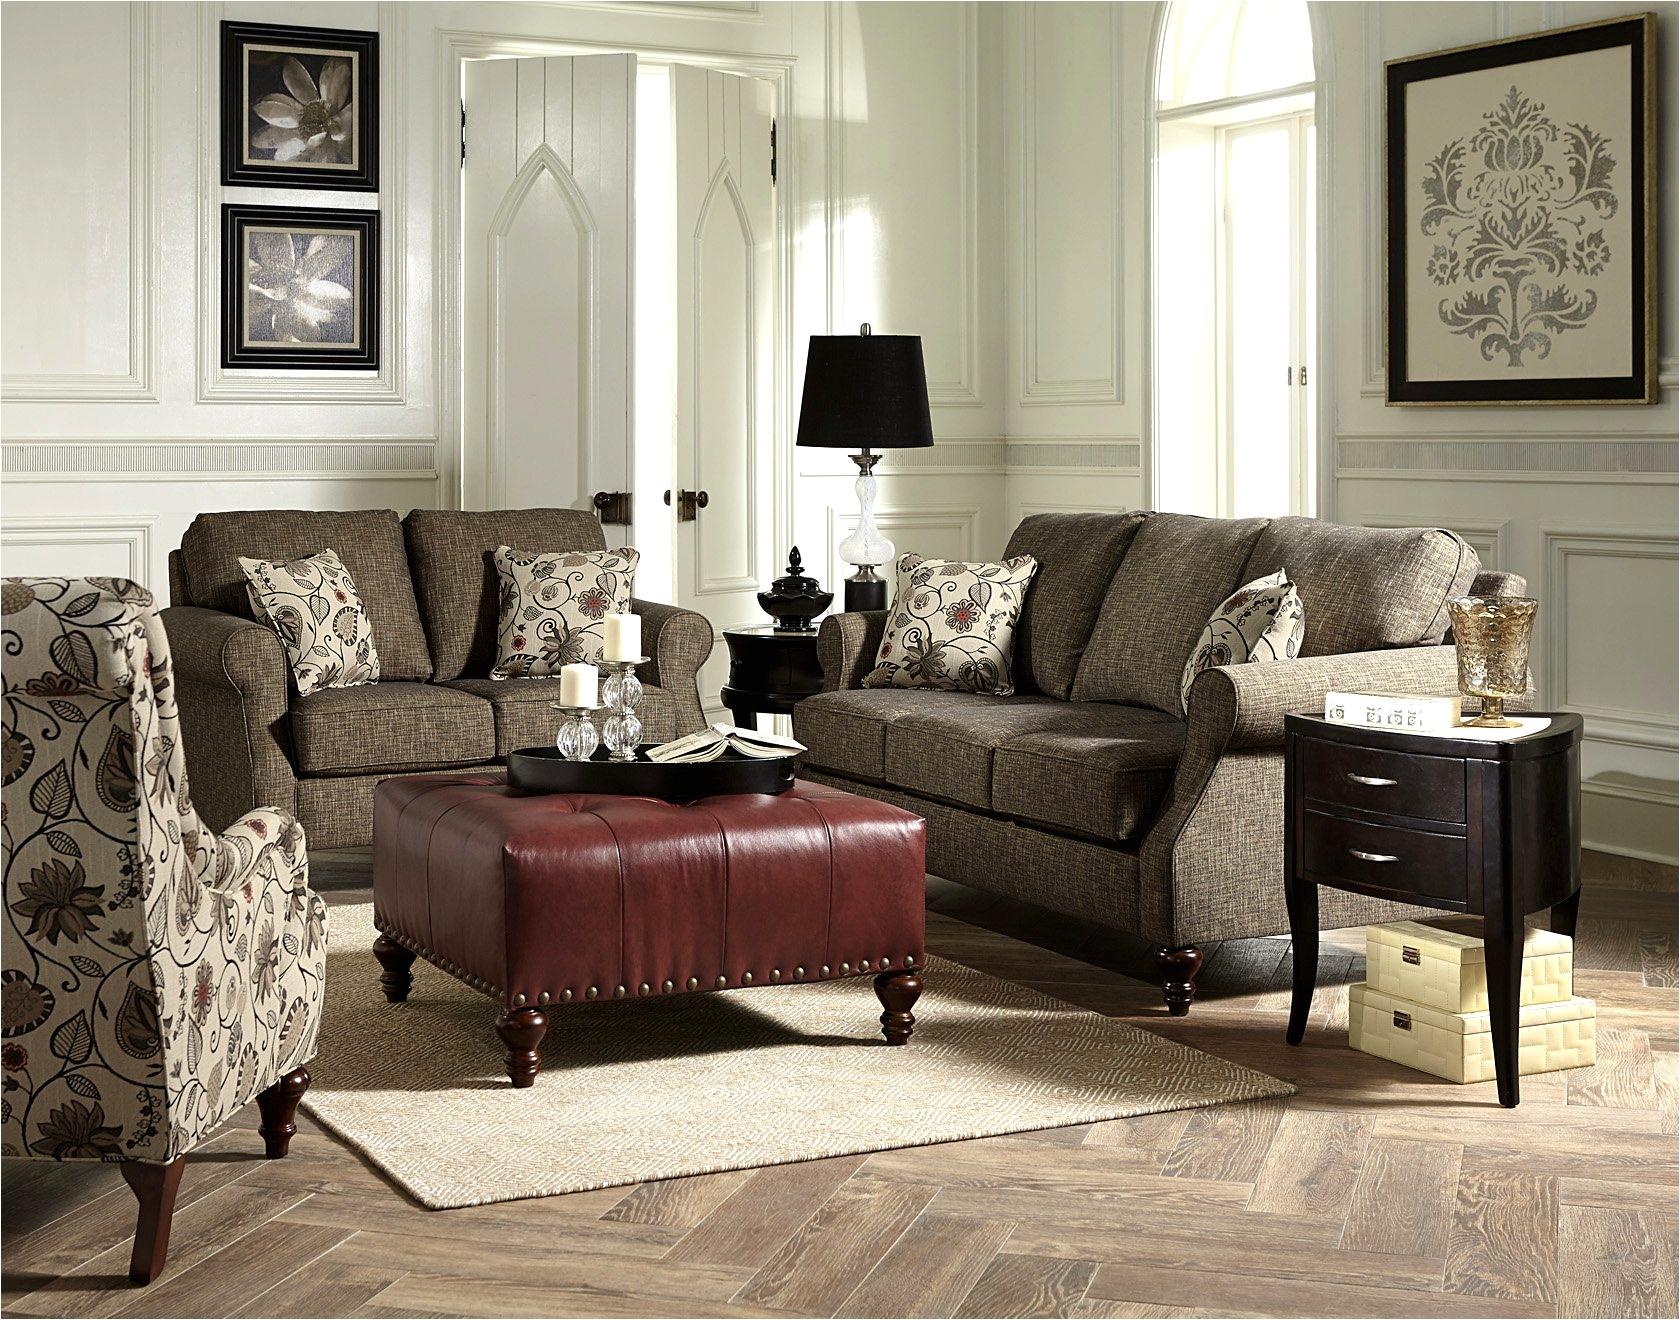 england furniture 1z00 with ophelia tweed and tulsa classic fabrics from patio furniture joplin mo sourcelovely patio furniture joplin mo